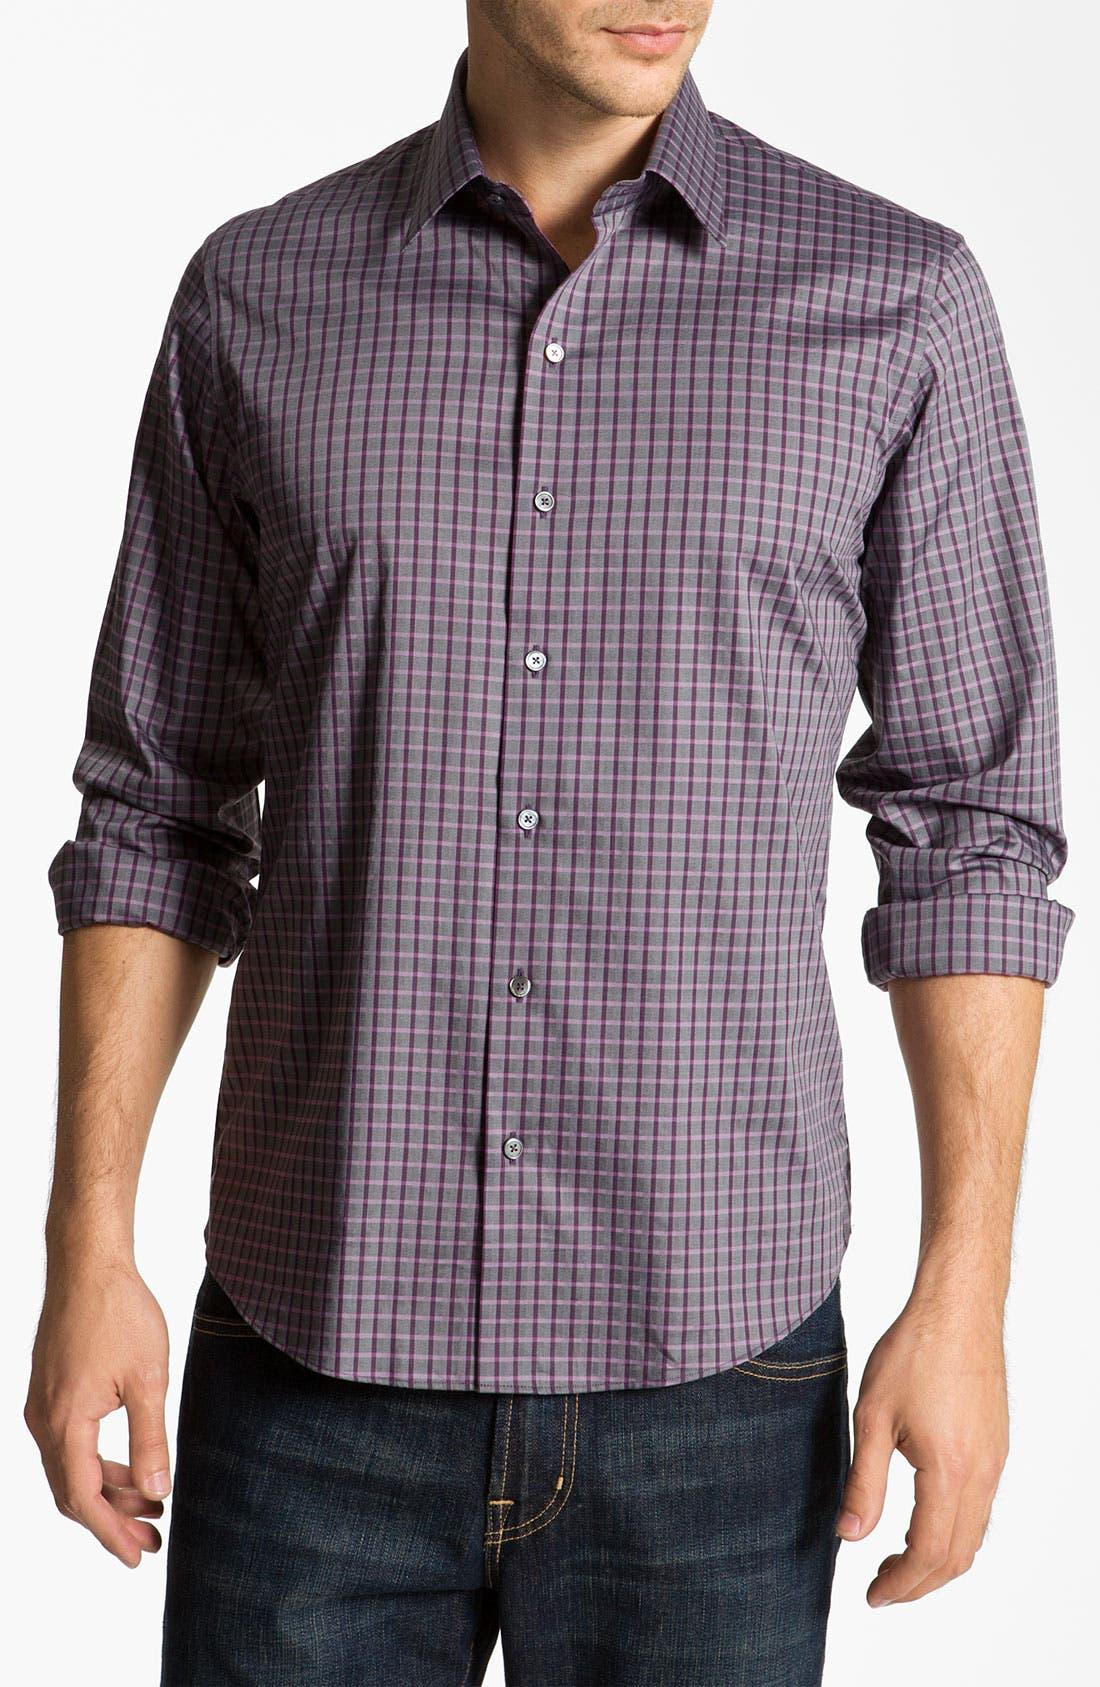 Alternate Image 1 Selected - Zachary Prell 'Joseph' Sport Shirt